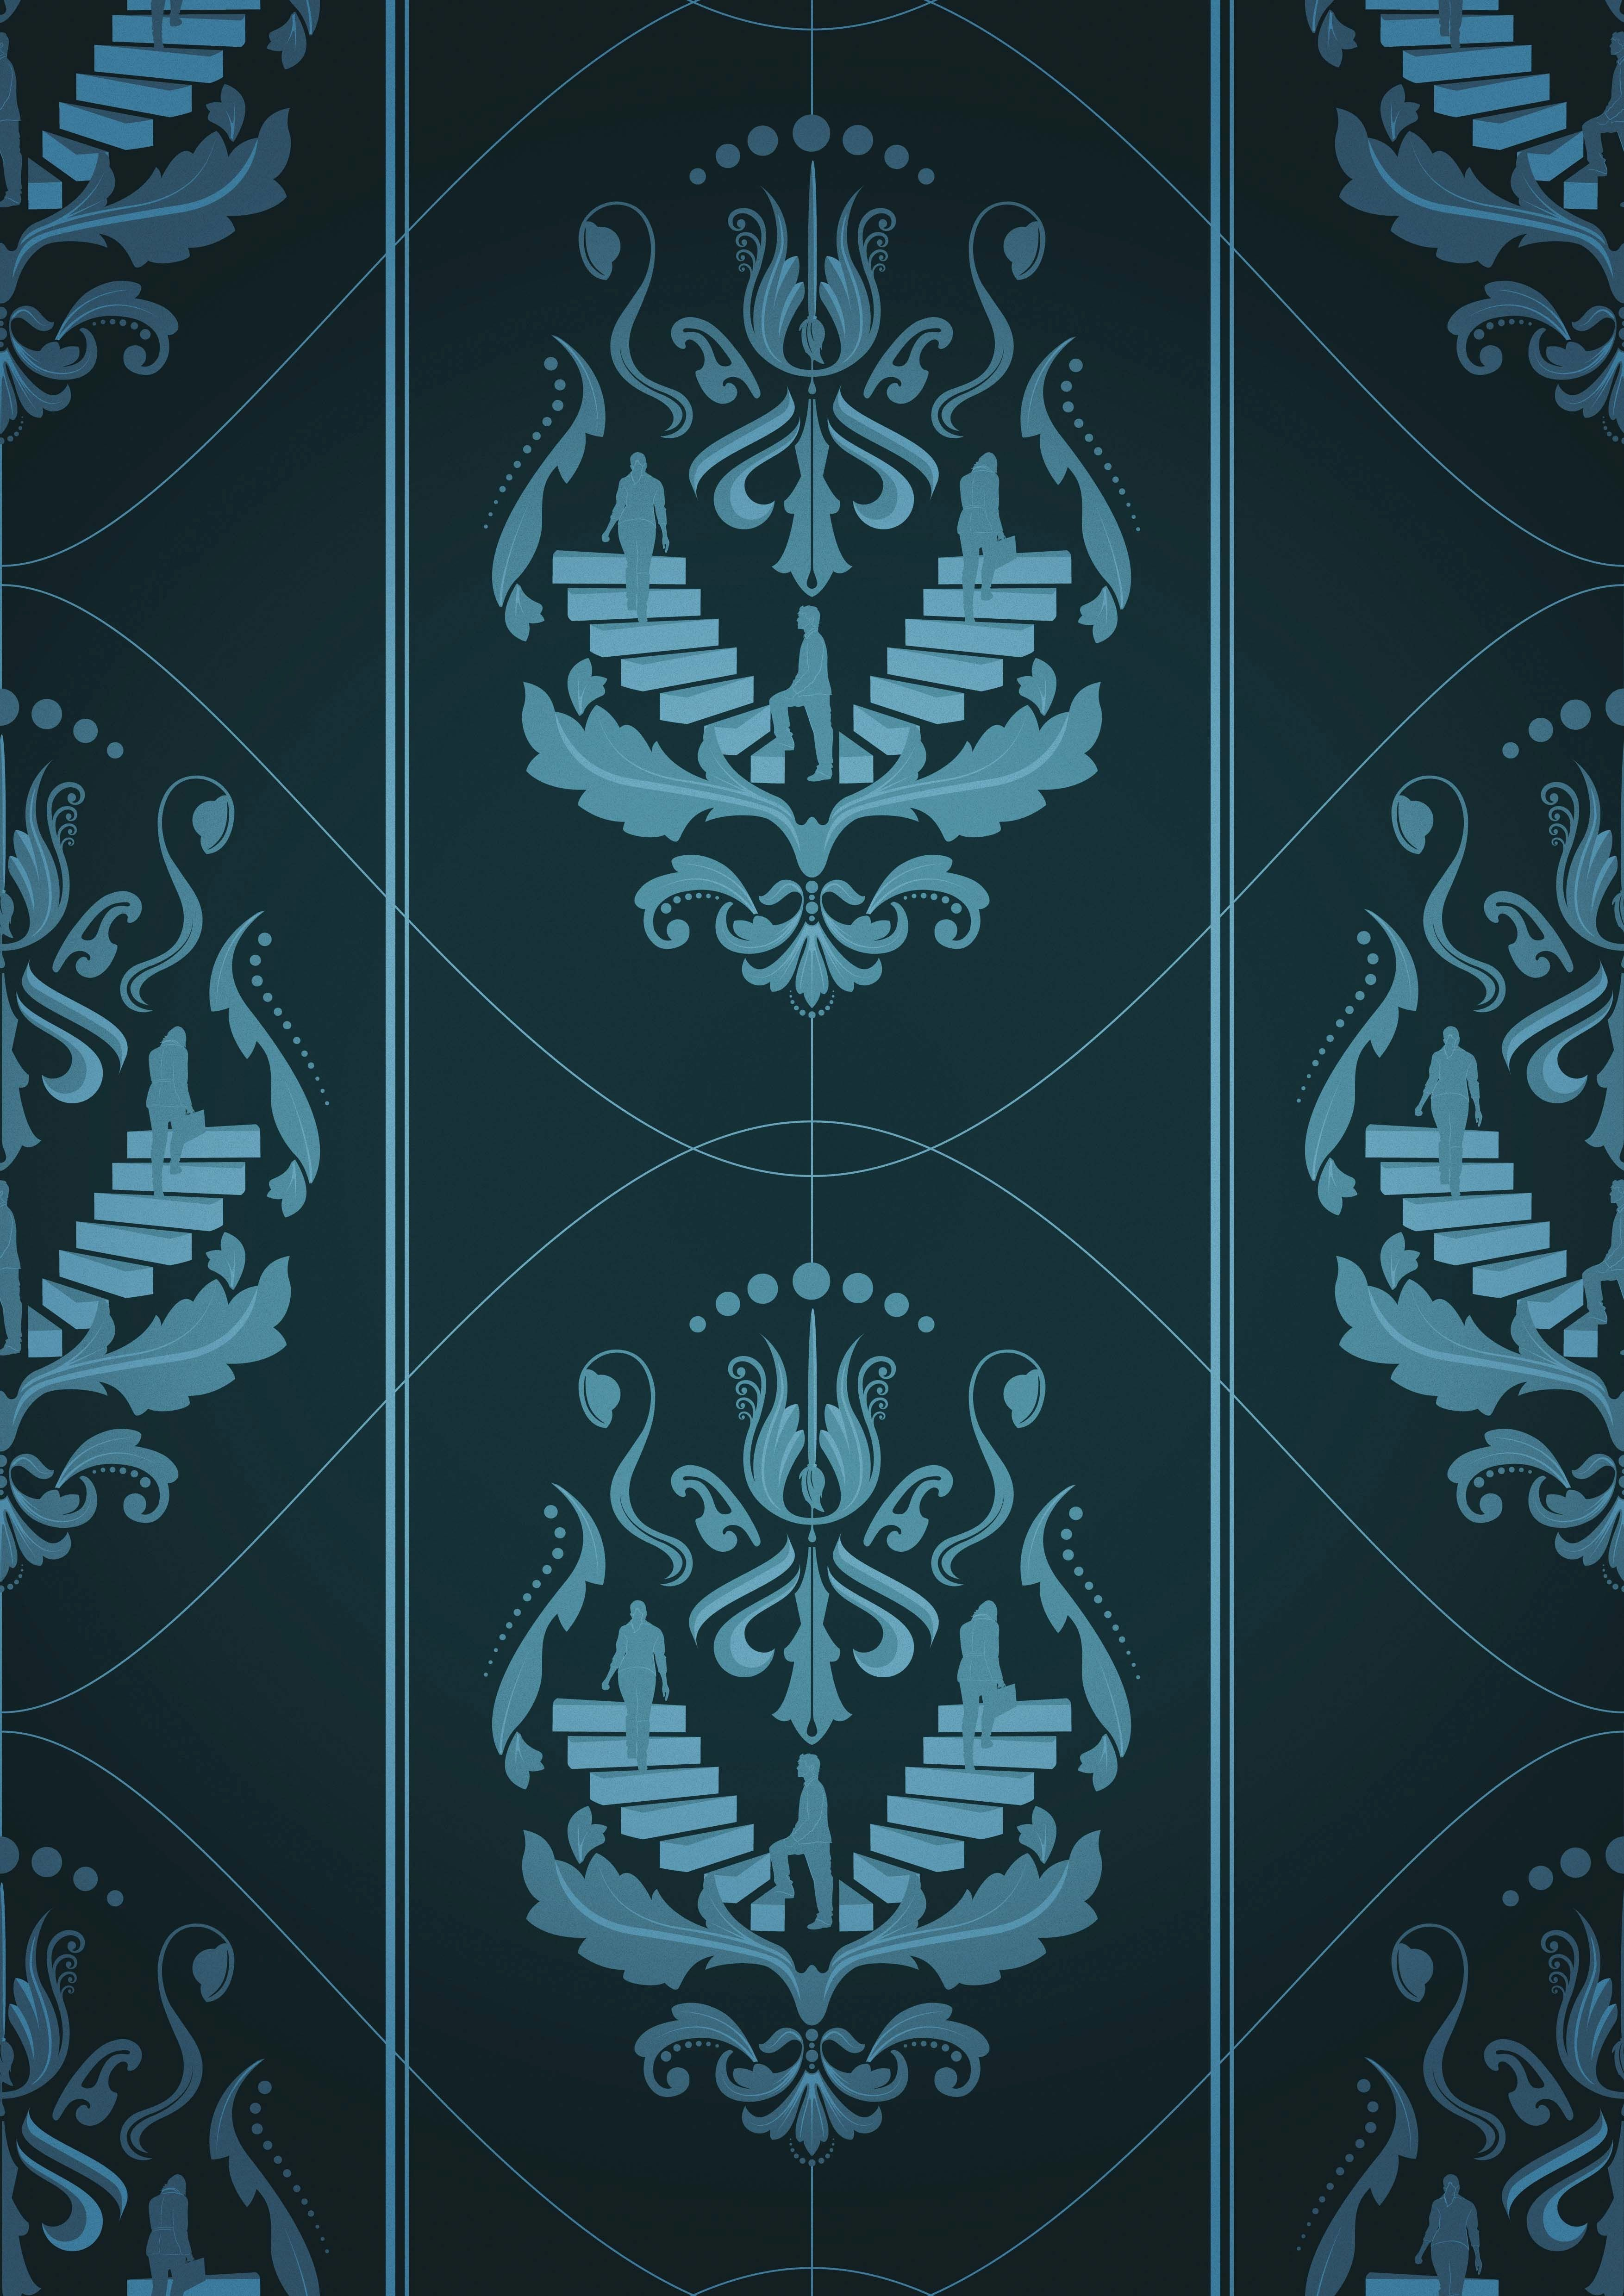 Adobe illustrator photoshop tutorial design damask patterns for adobe illustrator photoshop tutorial design damask patterns for wallpaper and homewares digital arts baditri Choice Image